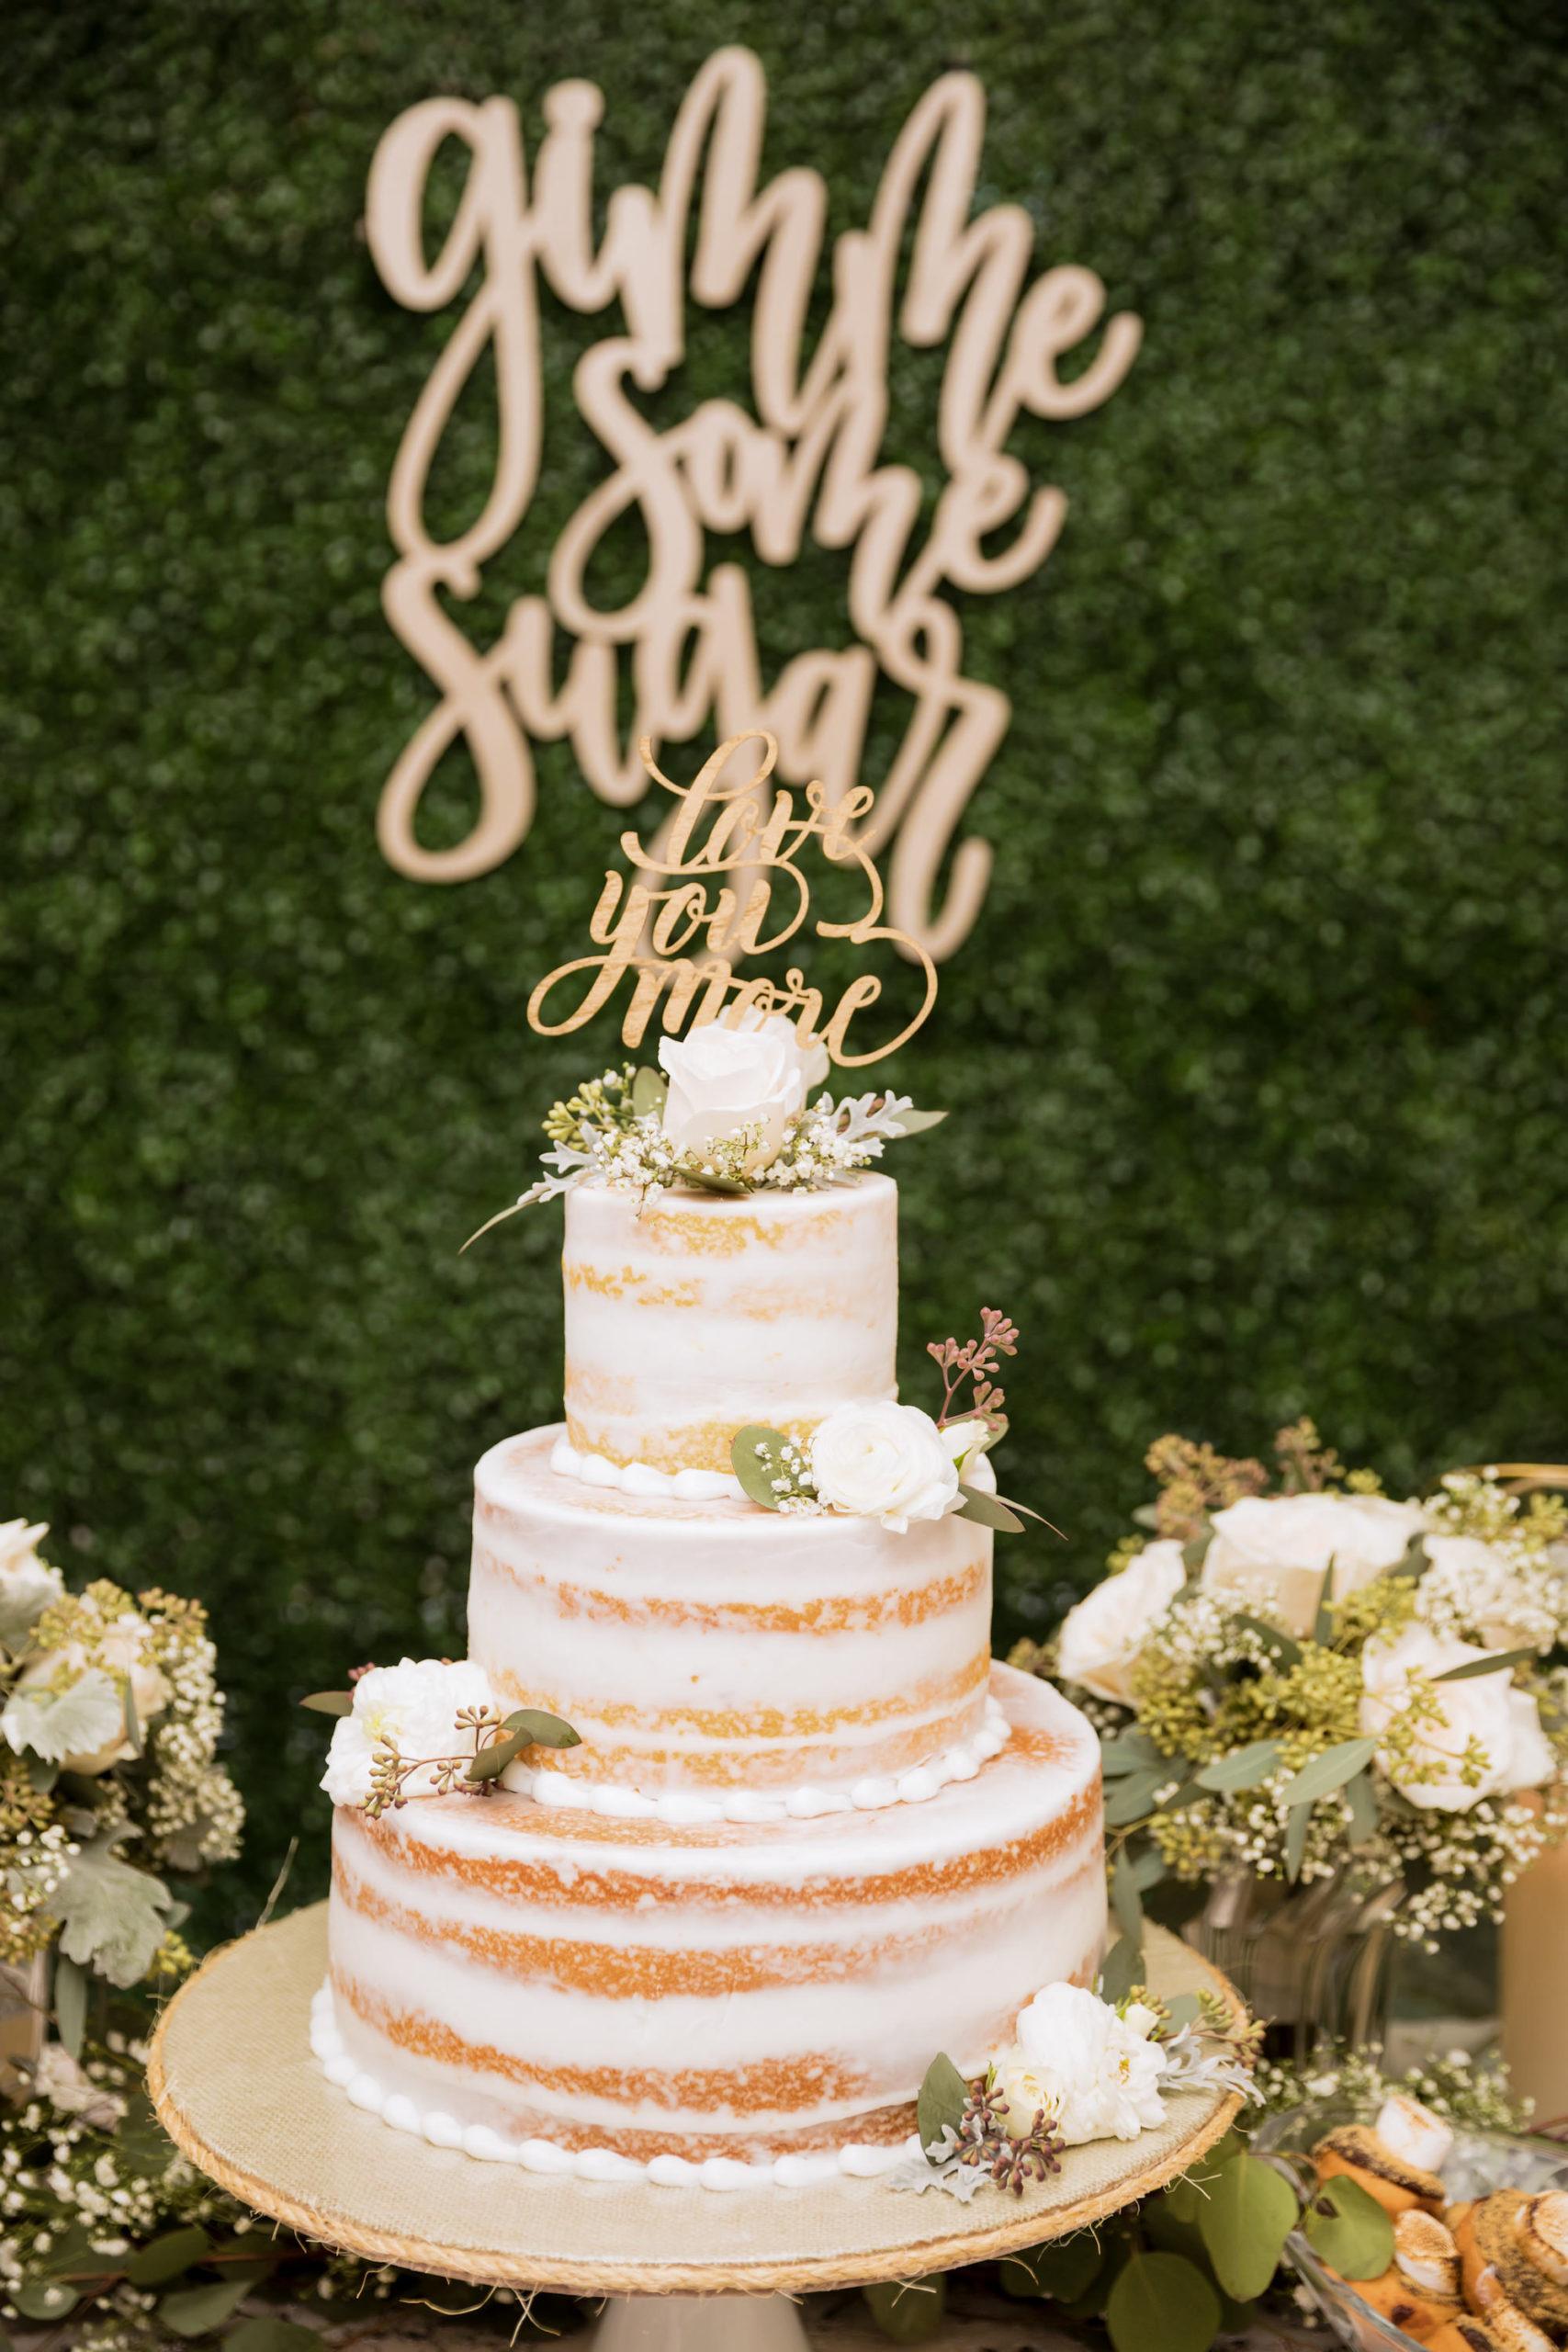 Rustic Elegant Semi Naked Three Tier Wedding Cake Garnished with White Roses   Tampa Bay Wedding Planner Coastal Coordinating